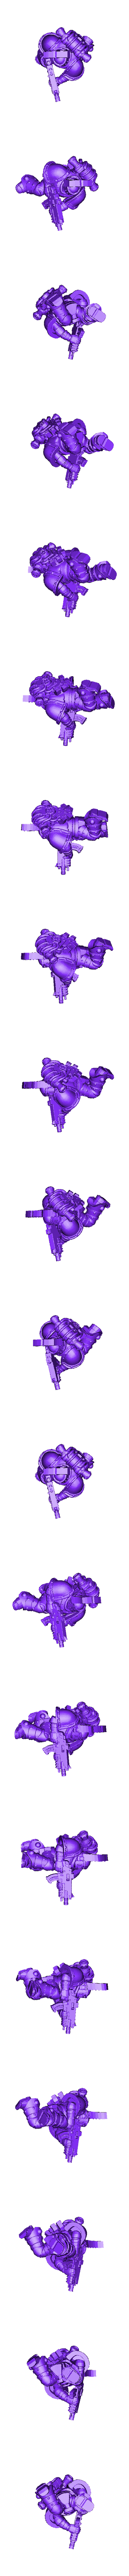 Marine1.stl Download free STL file Rubric Marines • 3D printer design, Mazer